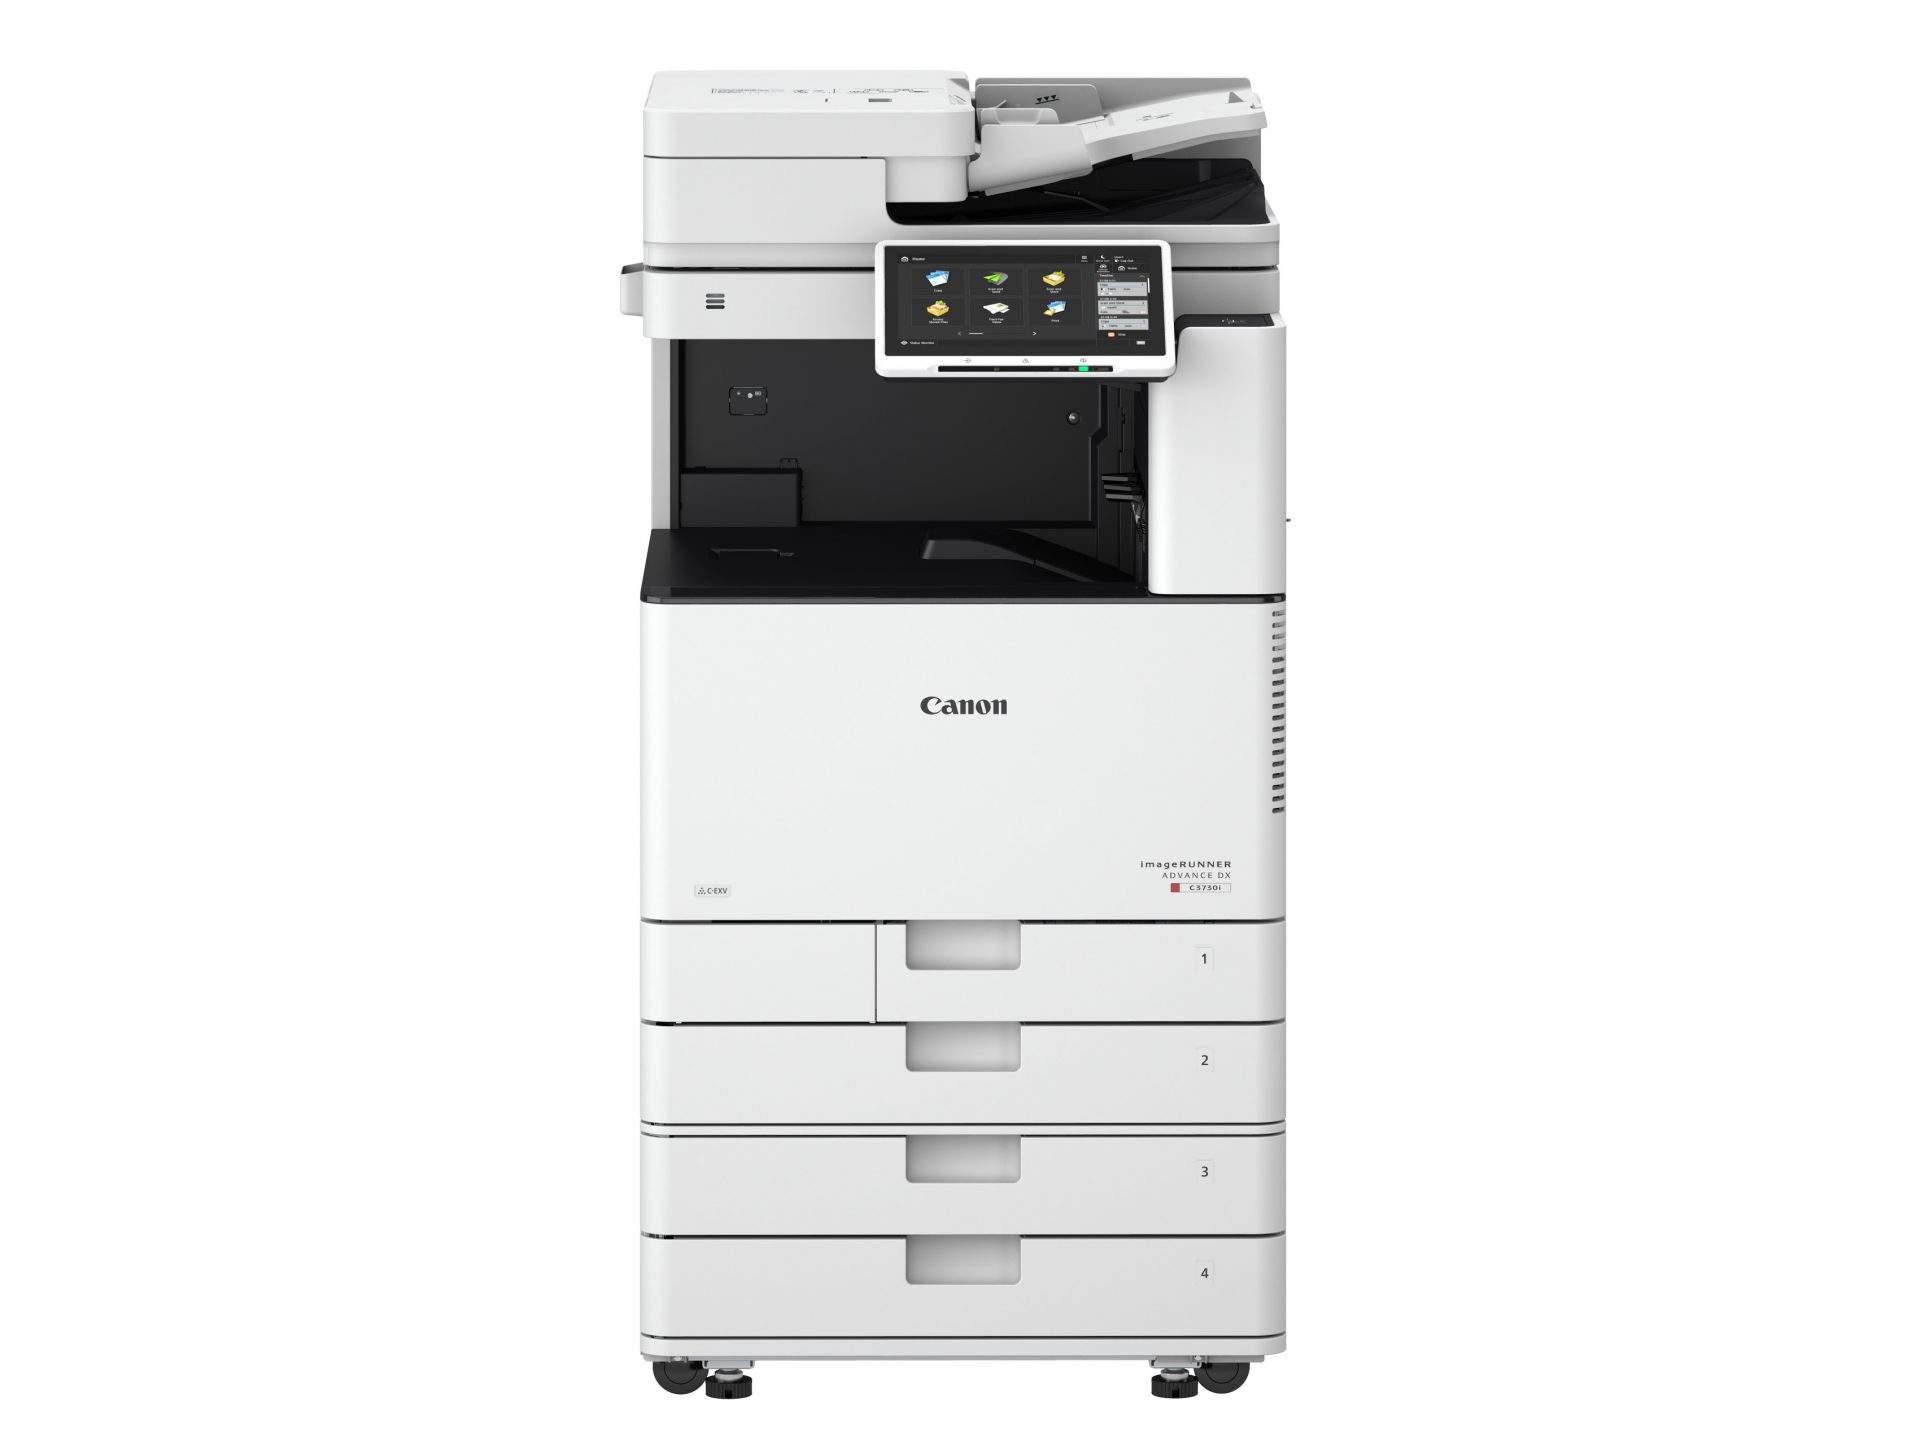 Office multifunction printer Imagerunner Advance DX 3700